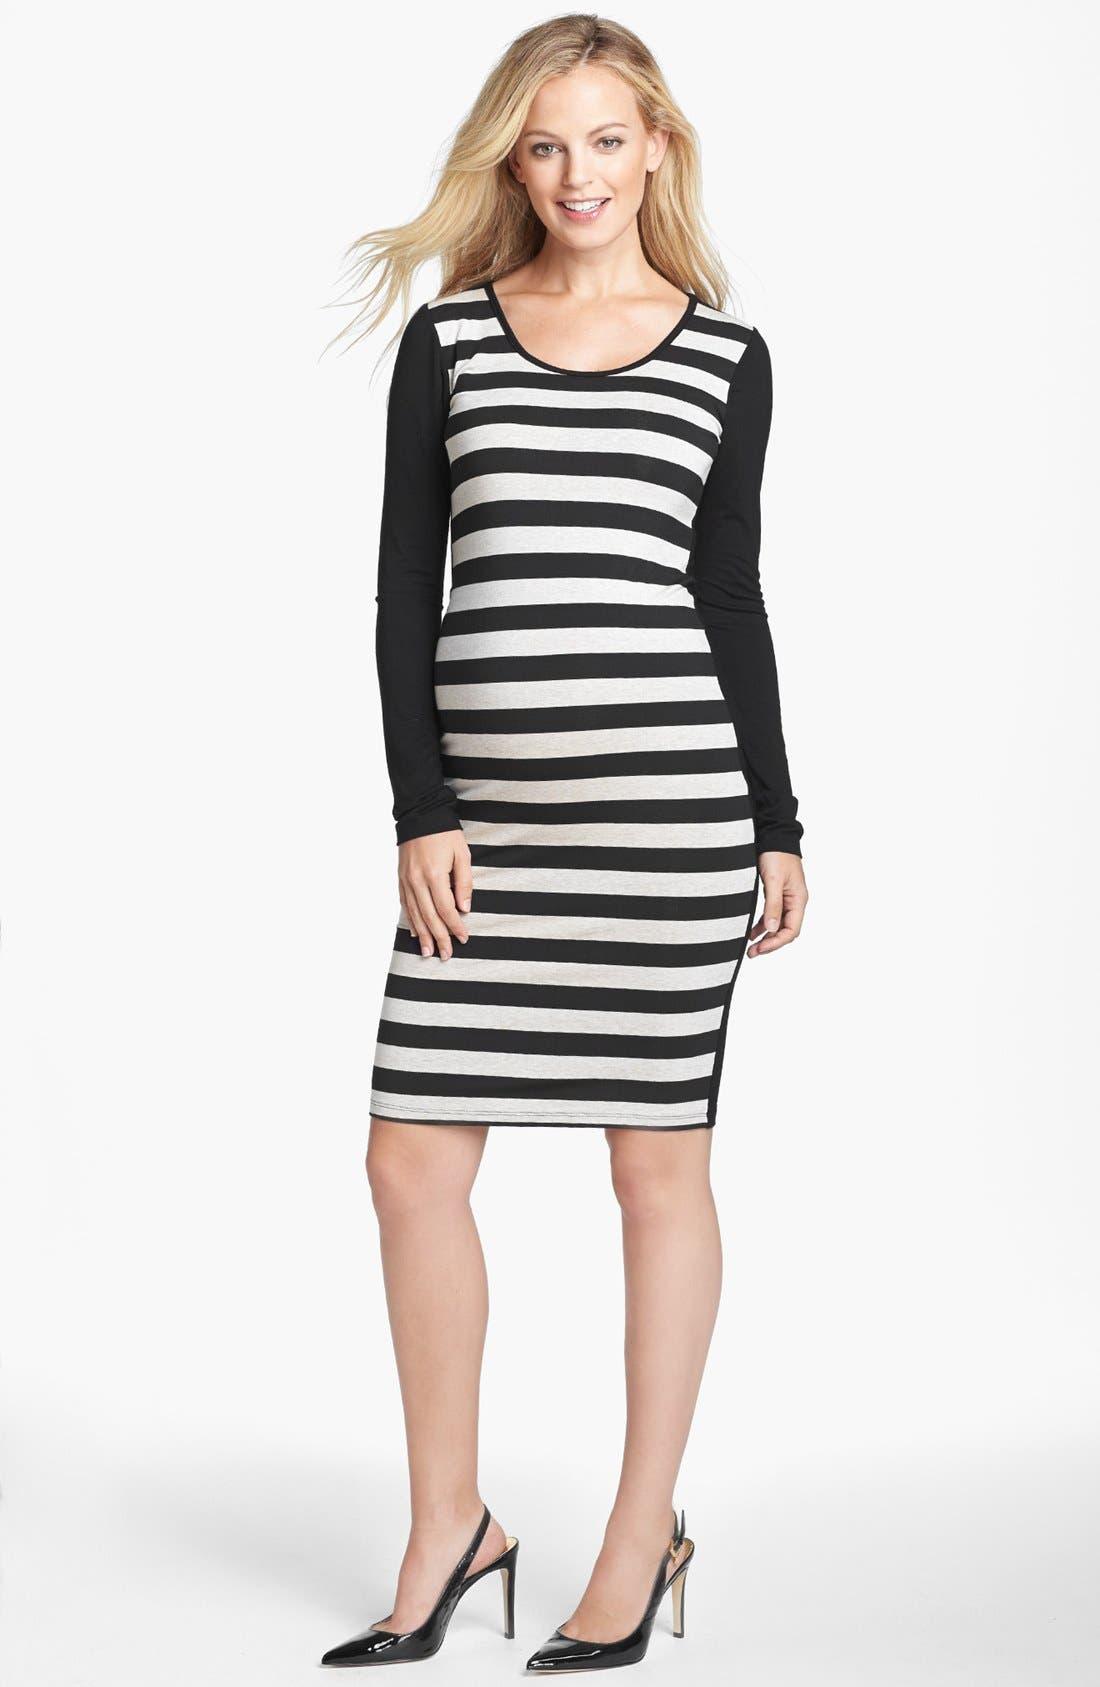 Main Image - Nom Maternity 'Krystal' Stripe Maternity Dress